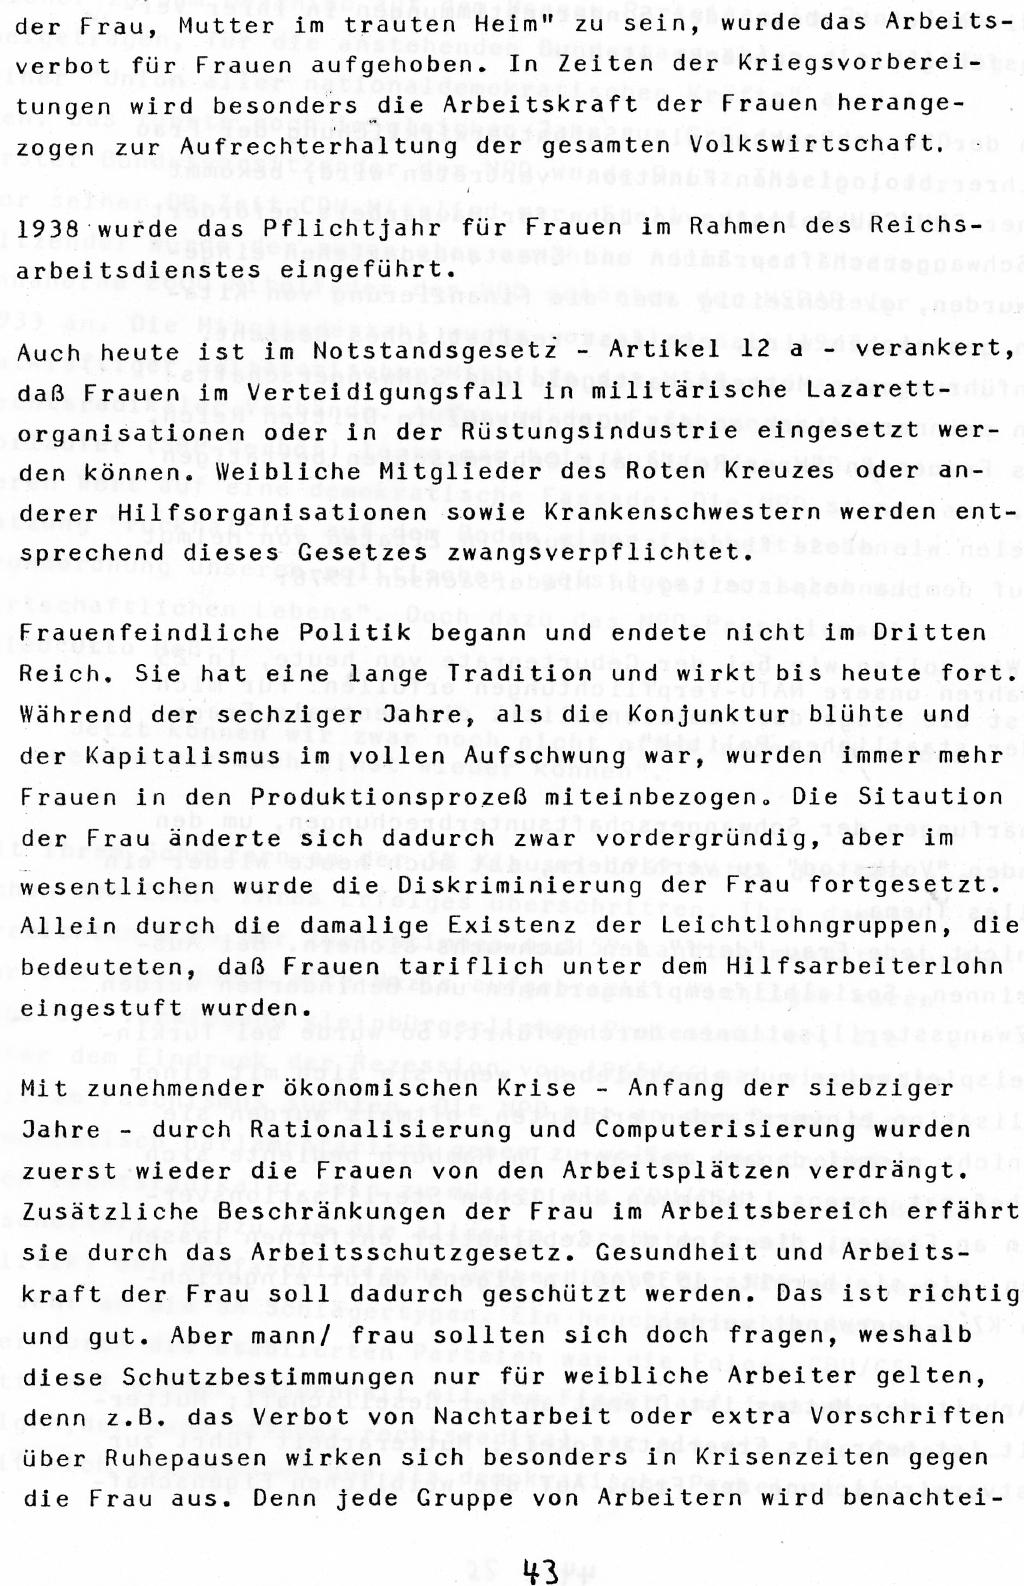 Berlin_1983_Autonome_Gruppen_Faschismus_im_Kapitalismus_43